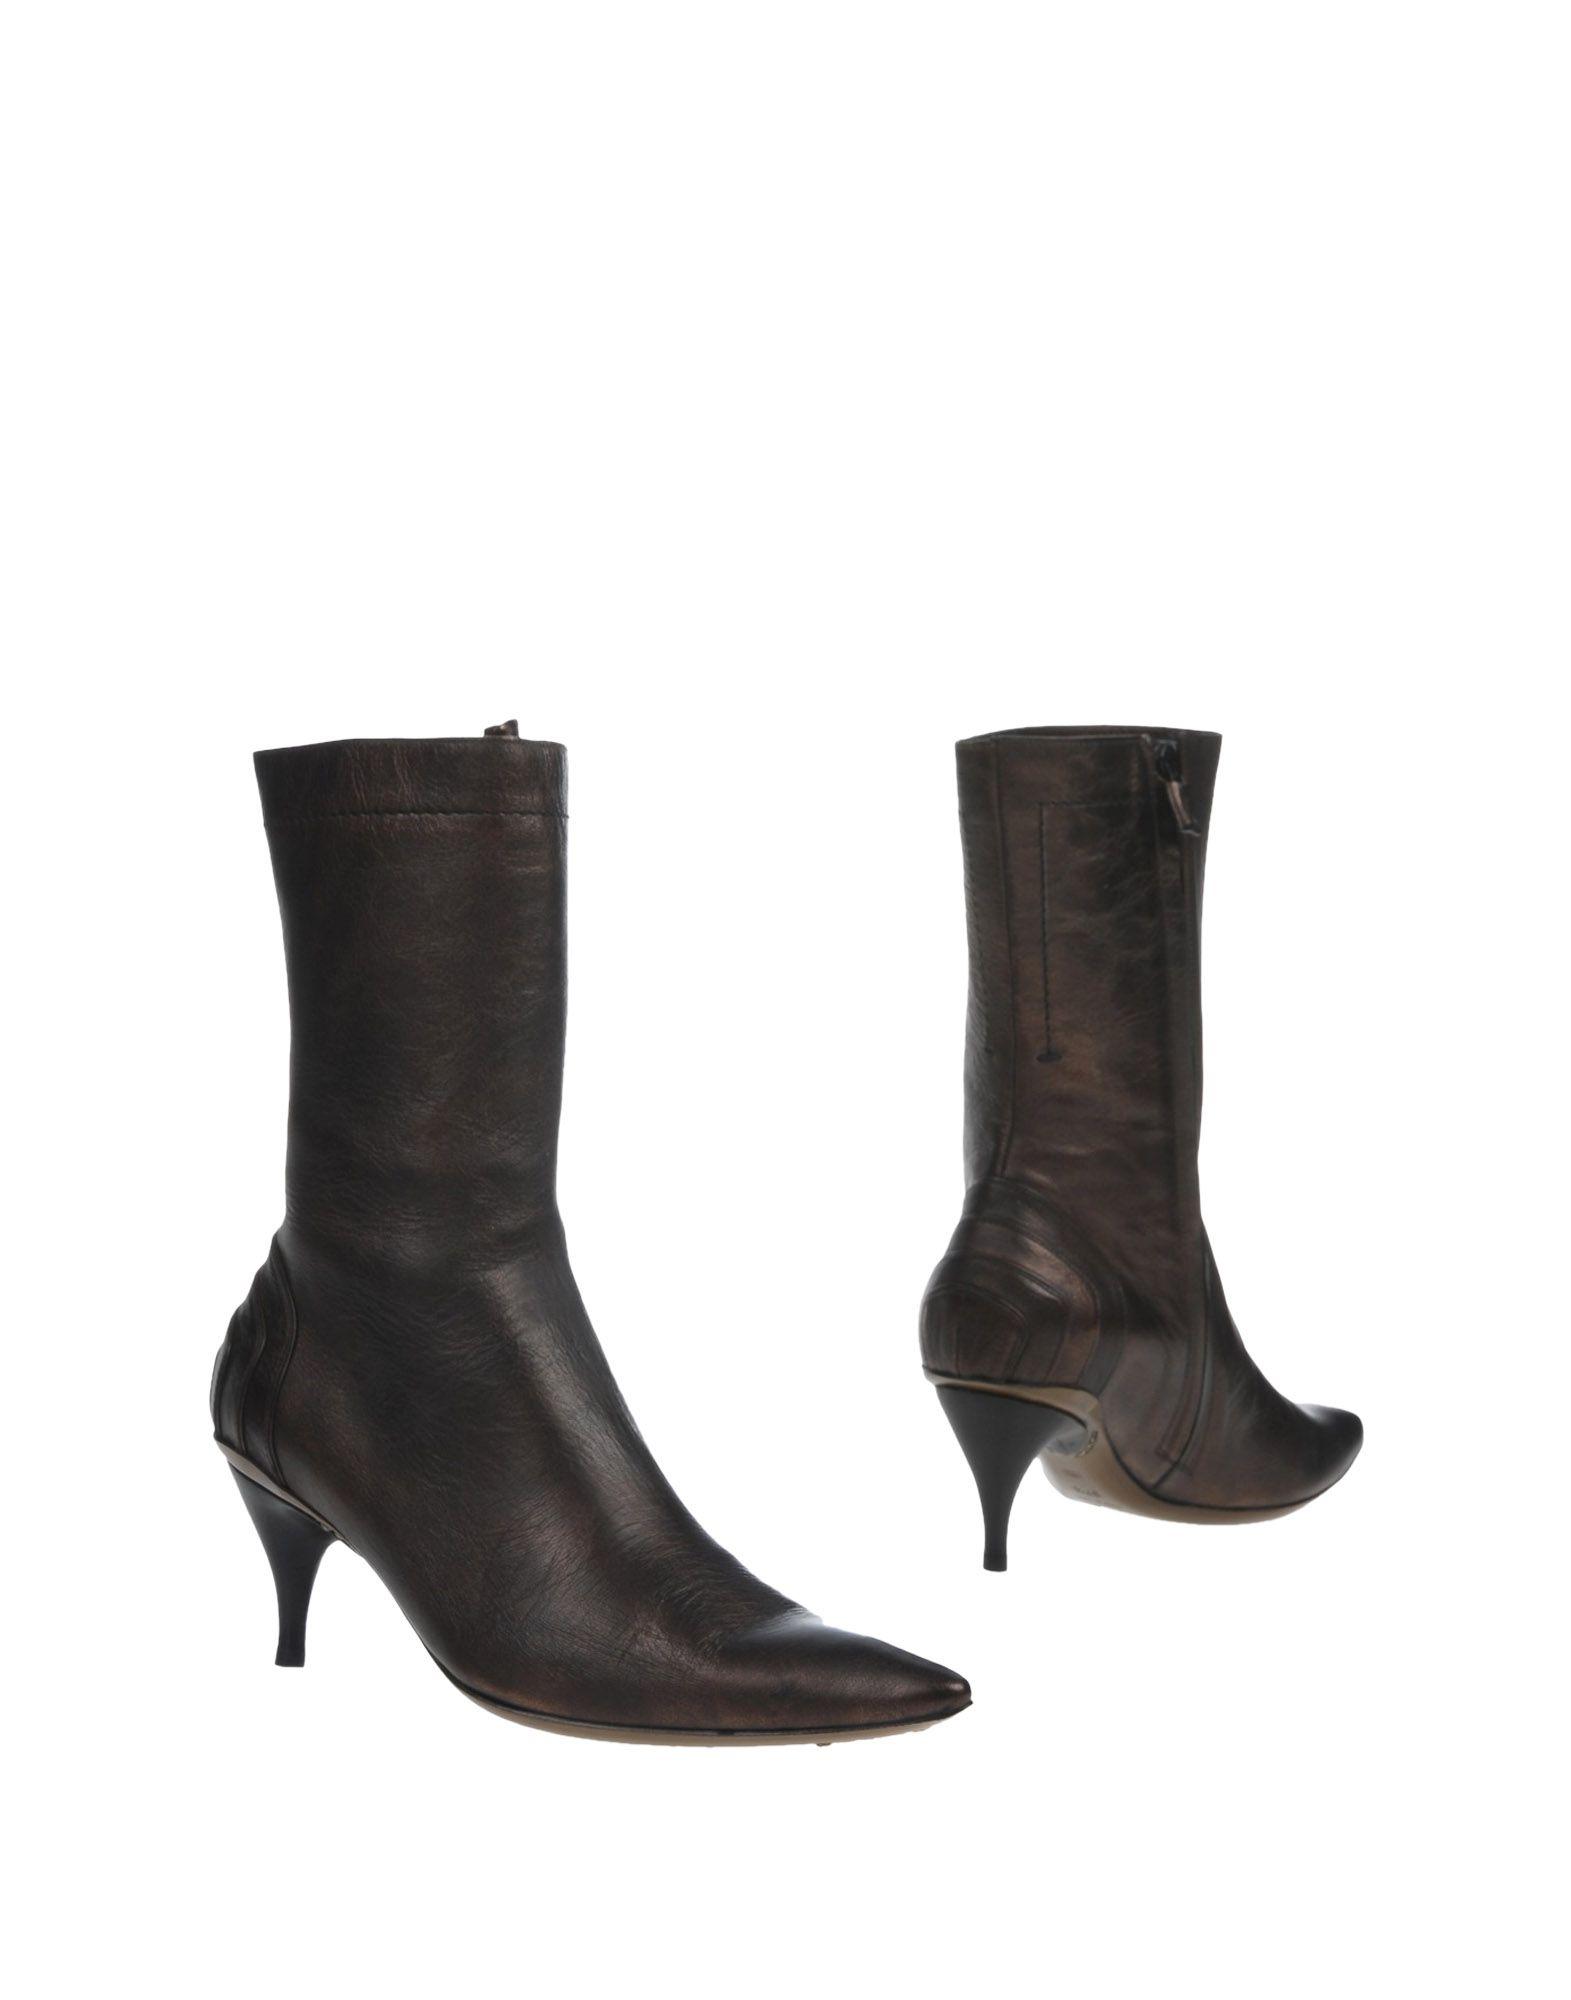 COSTUME NATIONAL LUXE Полусапоги и высокие ботинки цены онлайн